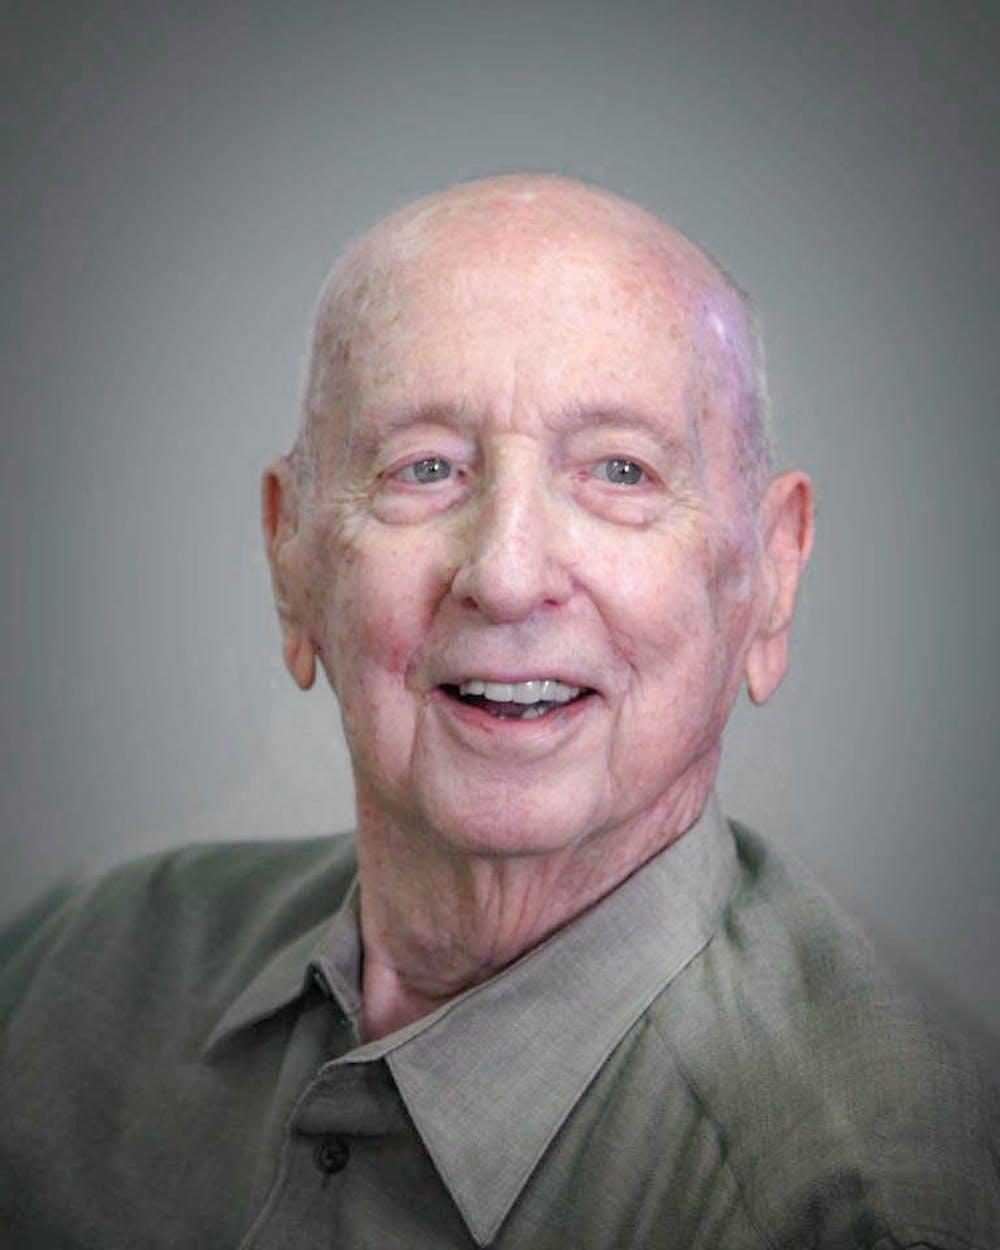 Remembering Leland Boren